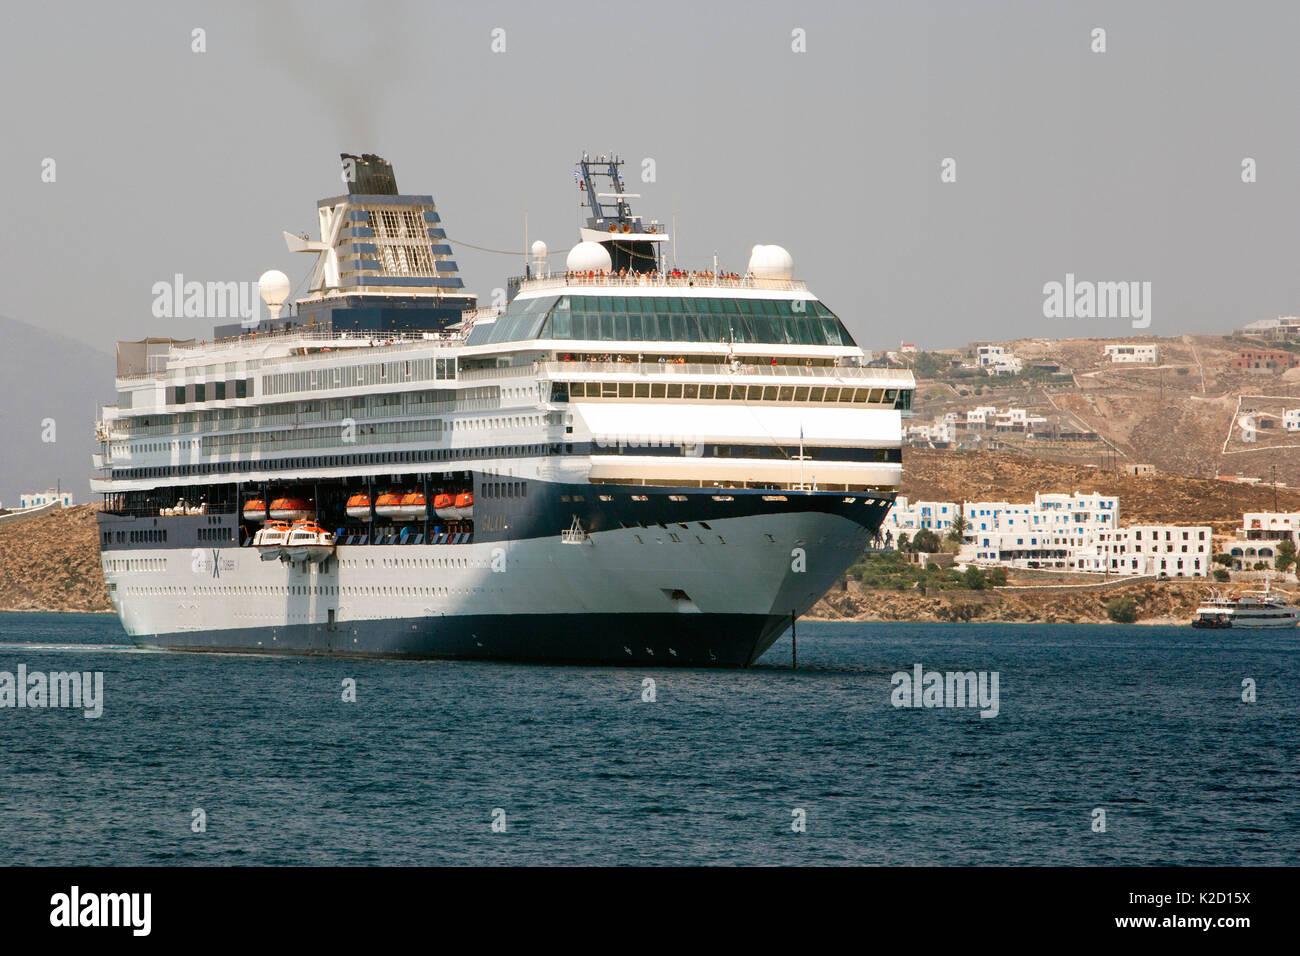 Celebrity Cruises 2019: Reviews, Photos & Activities